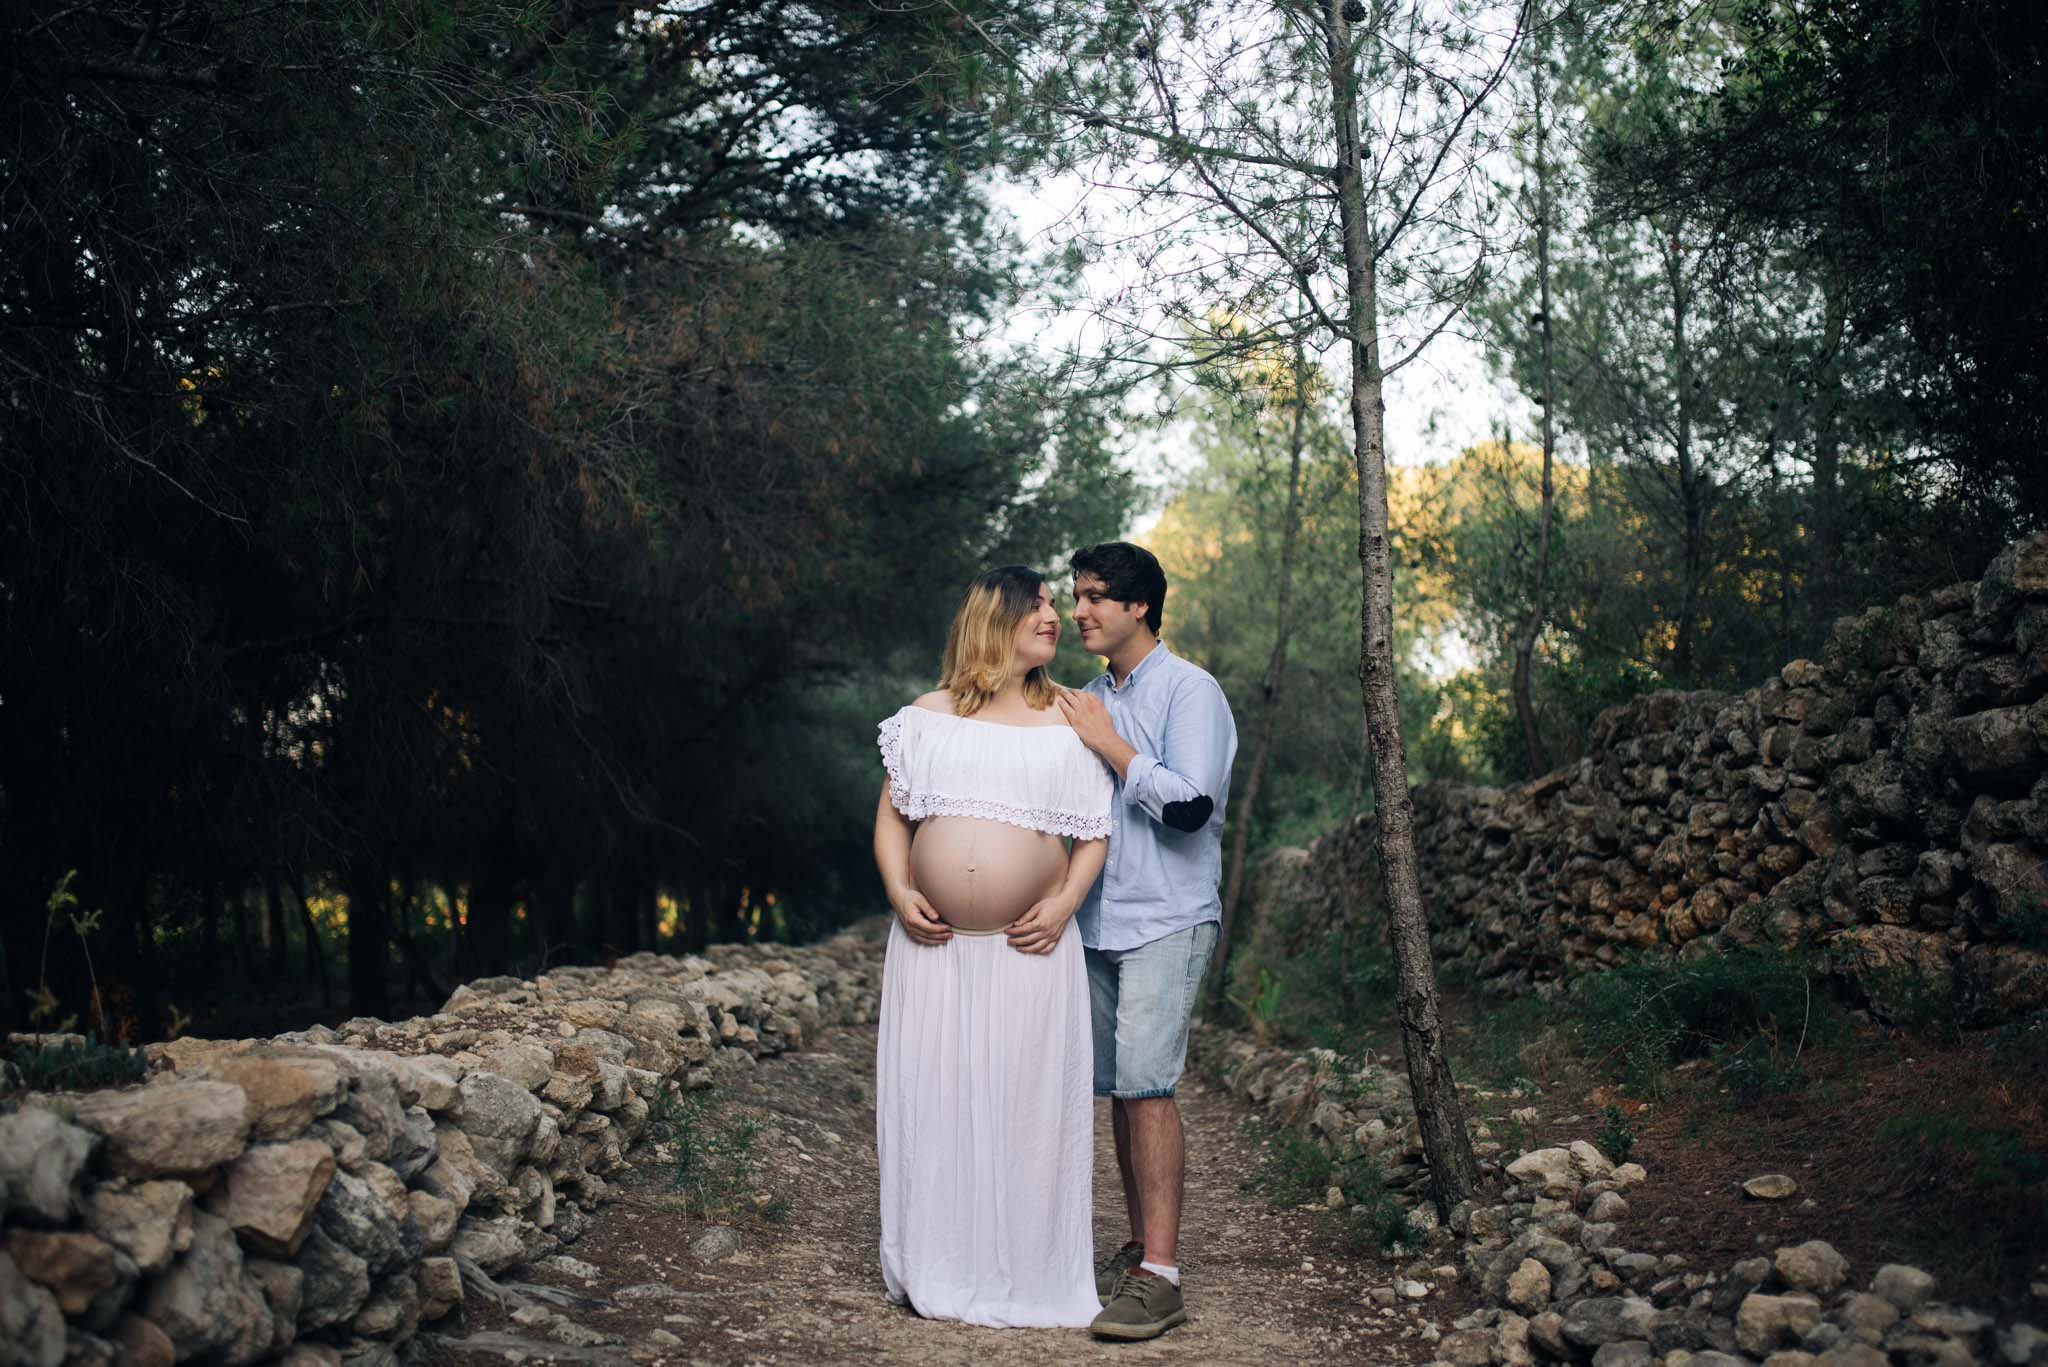 e6effb0c8 calella palafruguell fotografia premama embarazo barcelona playa - laura  arroyo fotografos igualada sitges vilanova i la geltru-19